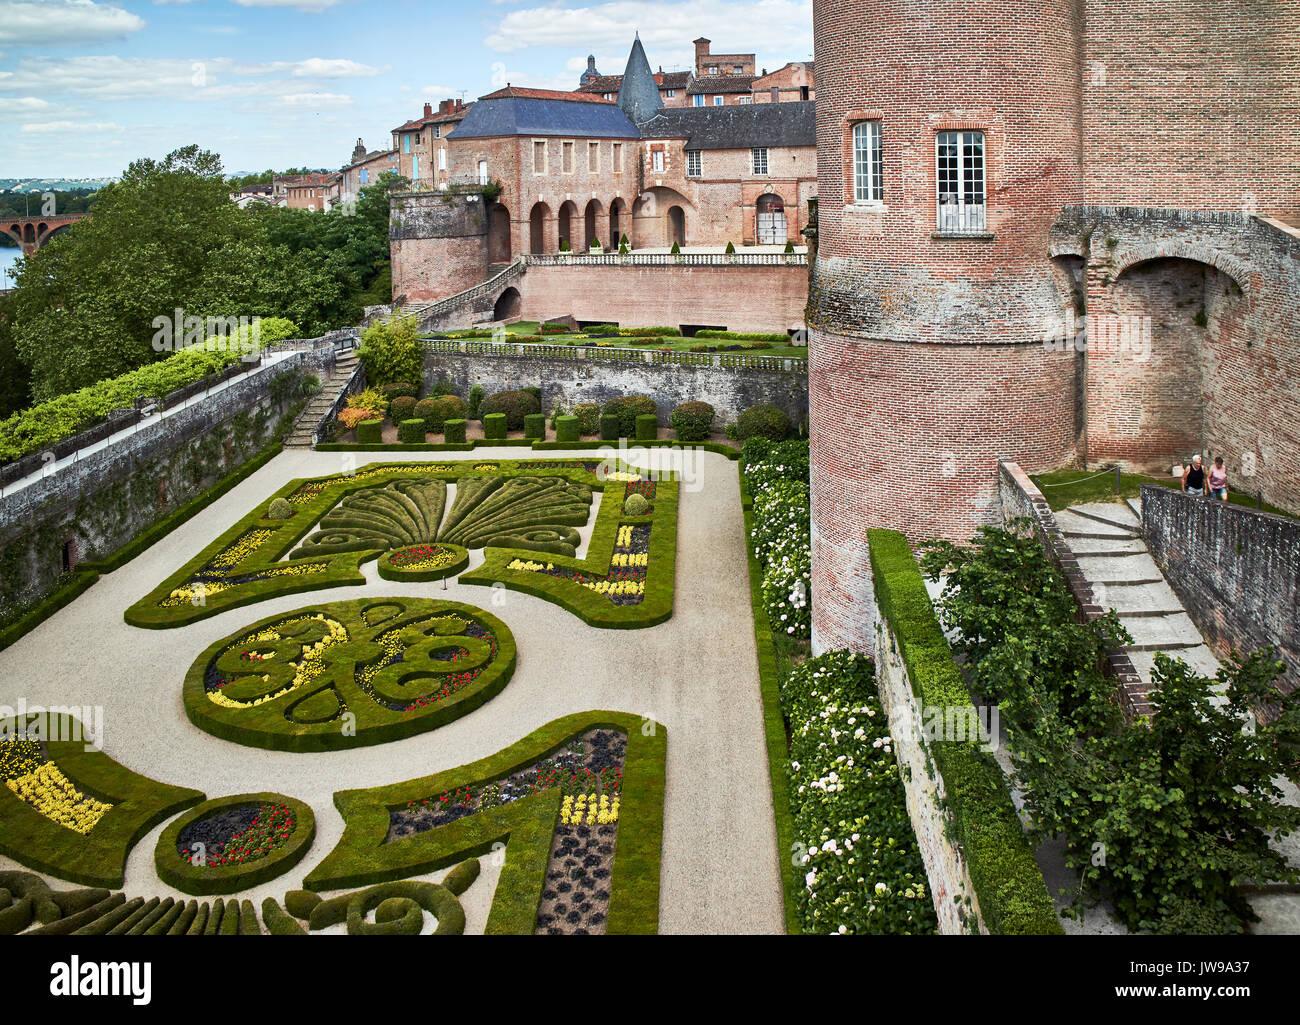 Europe, France, Occitanie,Tarn, Albi city,Berbie palace, the garden and the Tarn river Stock Photo